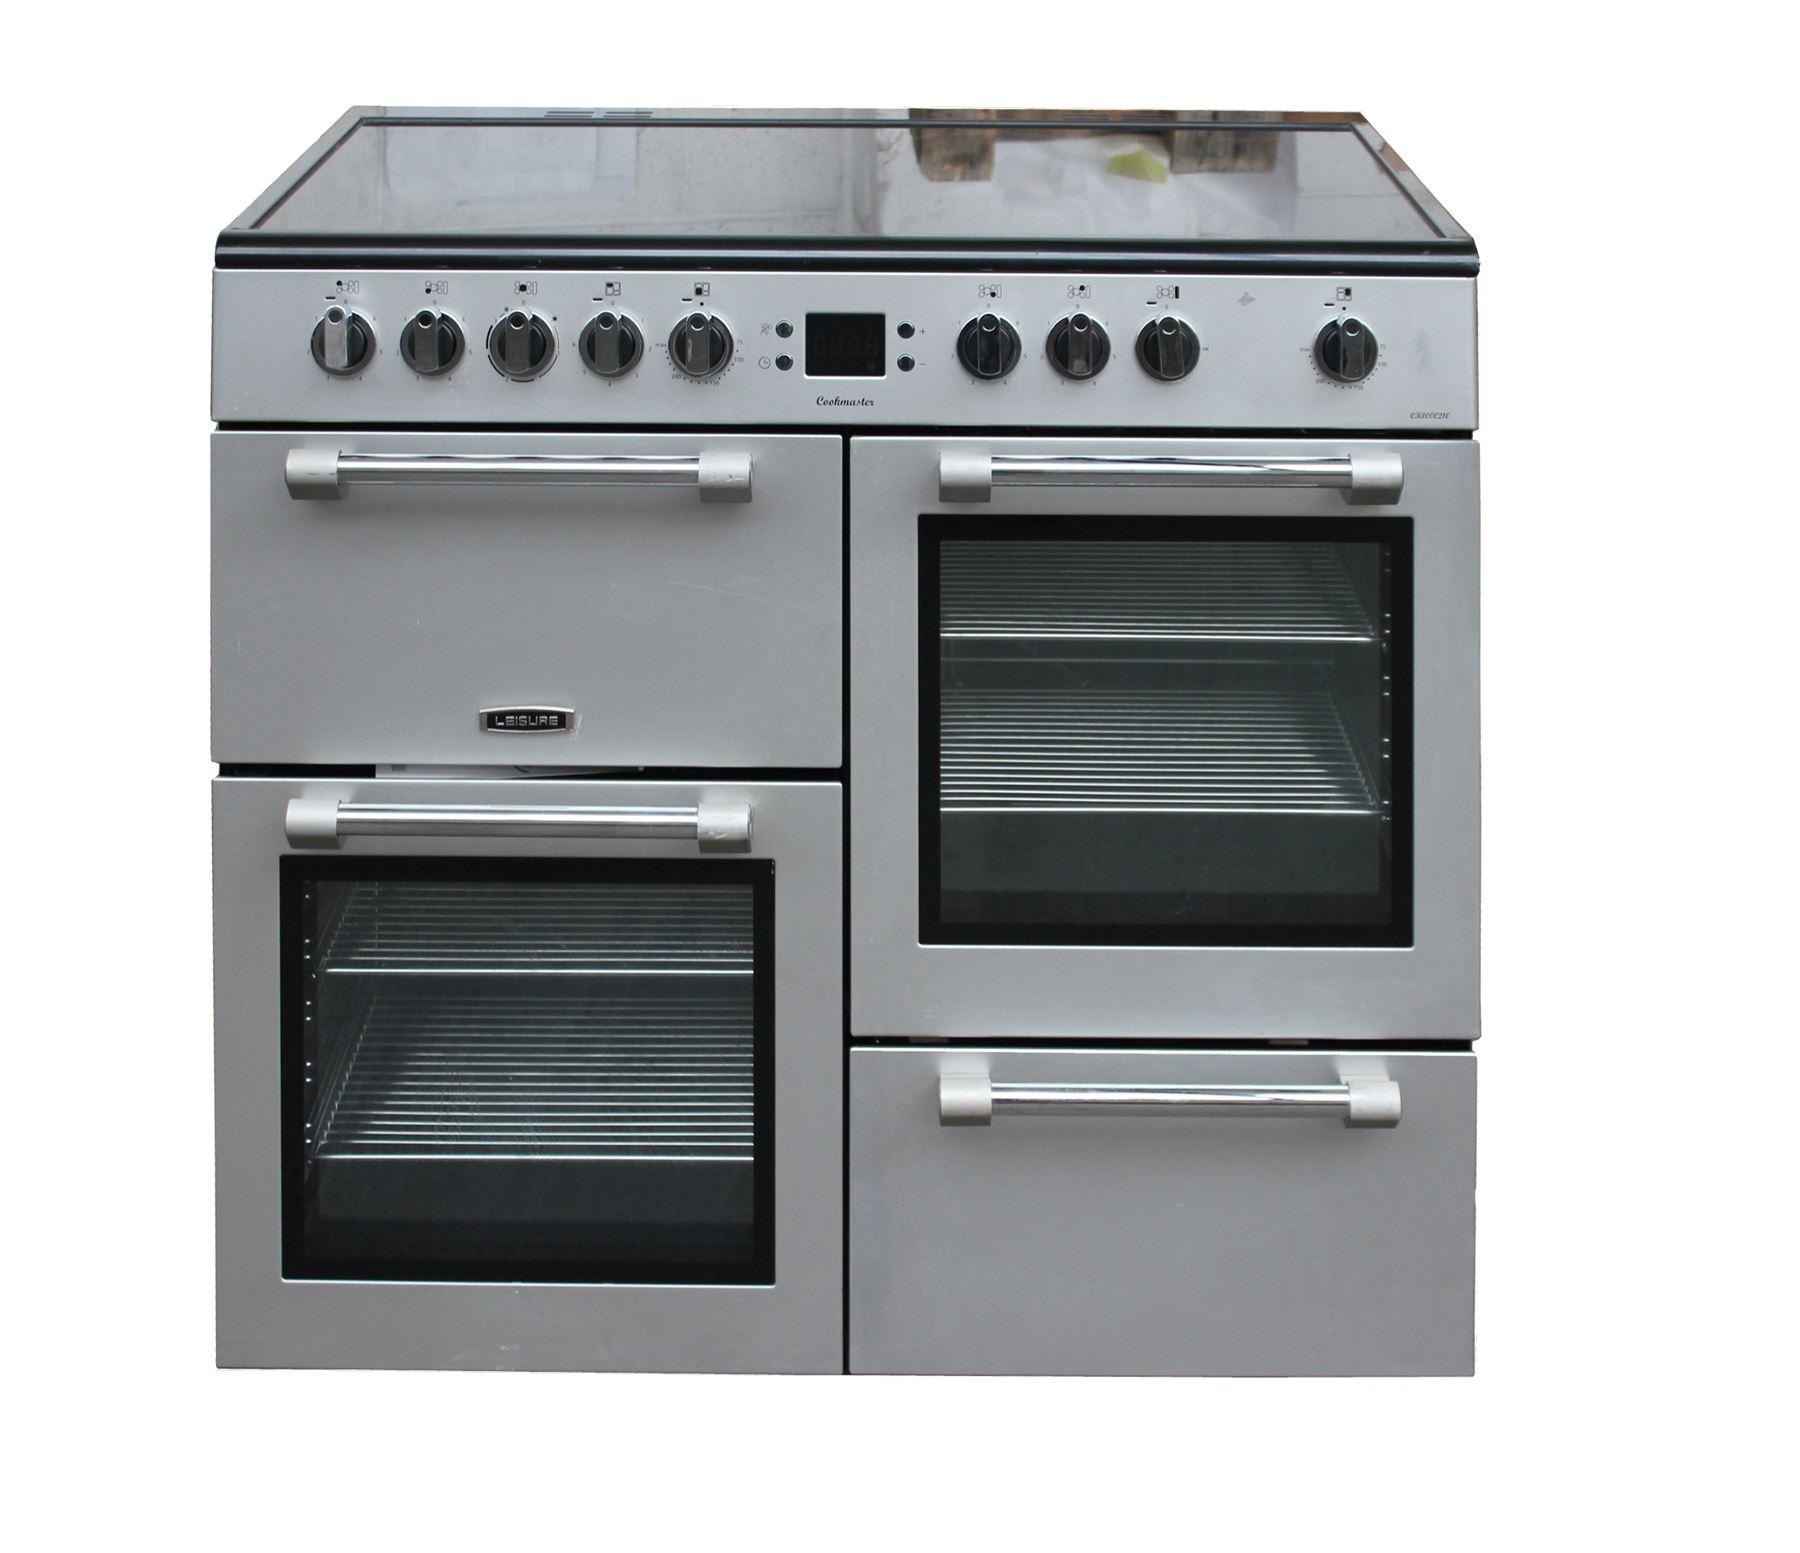 Leisure Electric Range Cooker 100 Cm Ceramic Double Oven